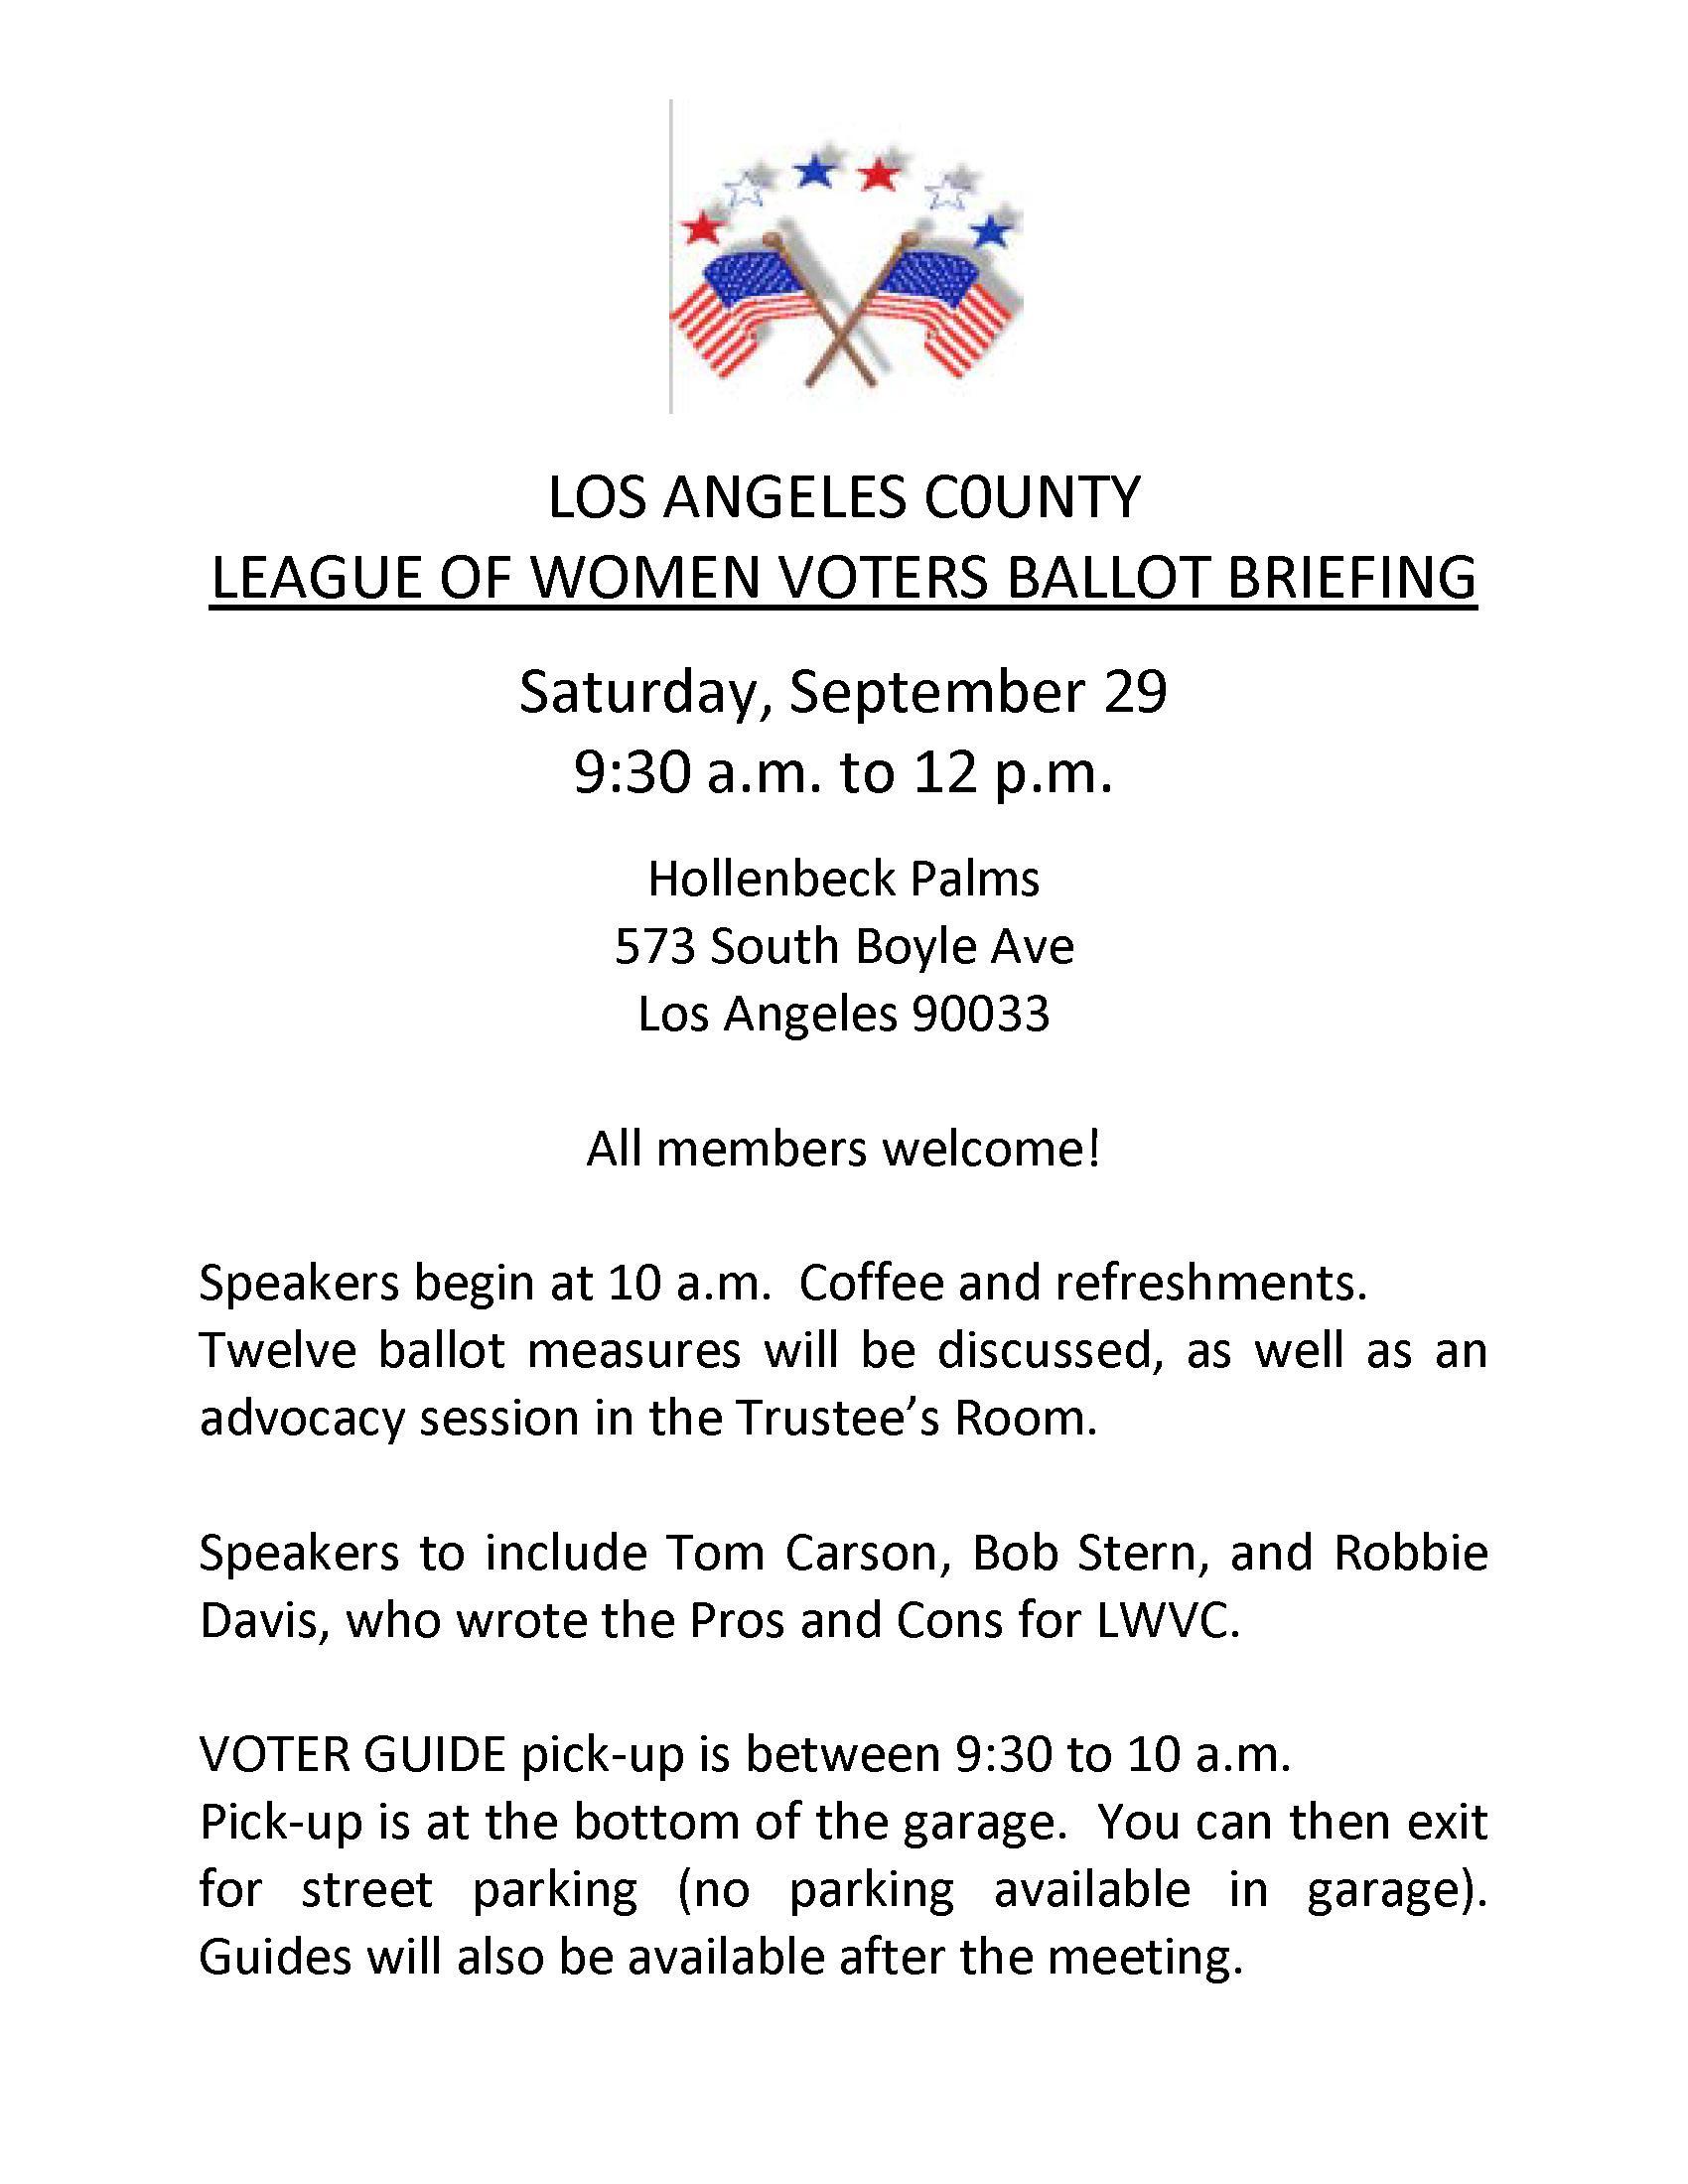 lac-ballot briefing